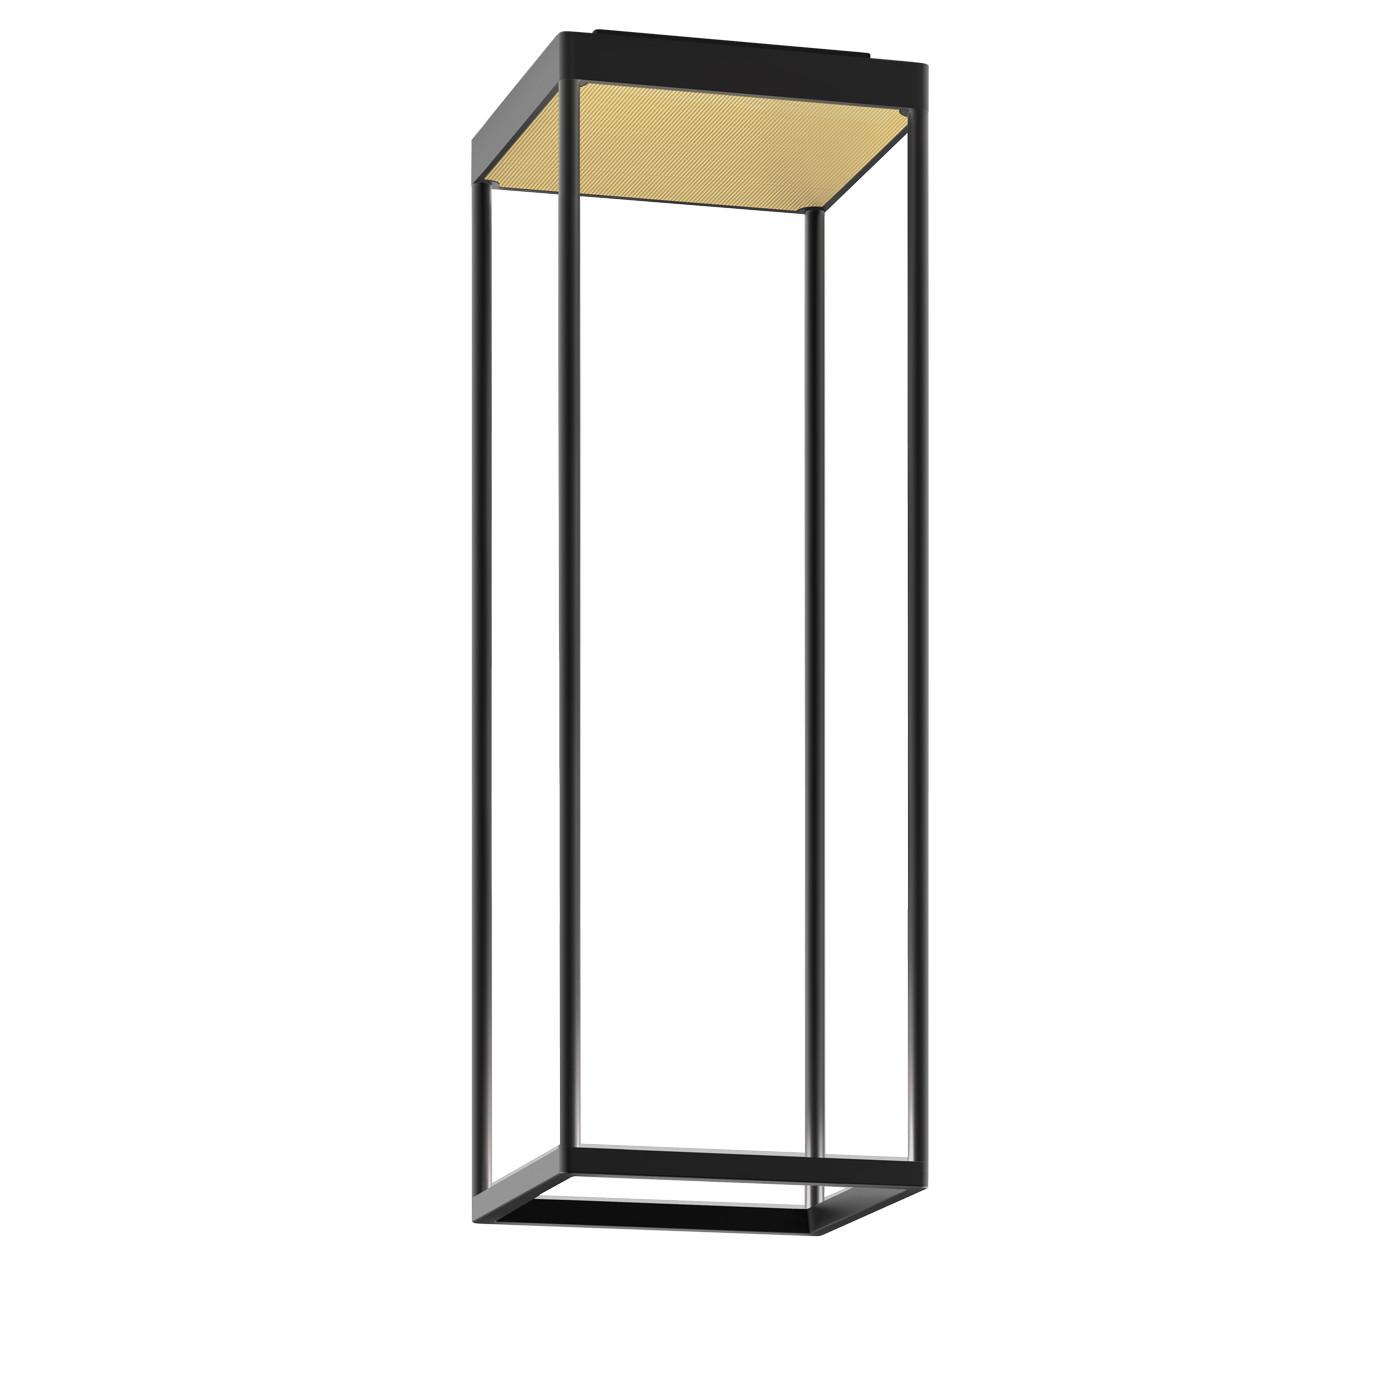 Serien Lighting Reflex² Ceiling S 600